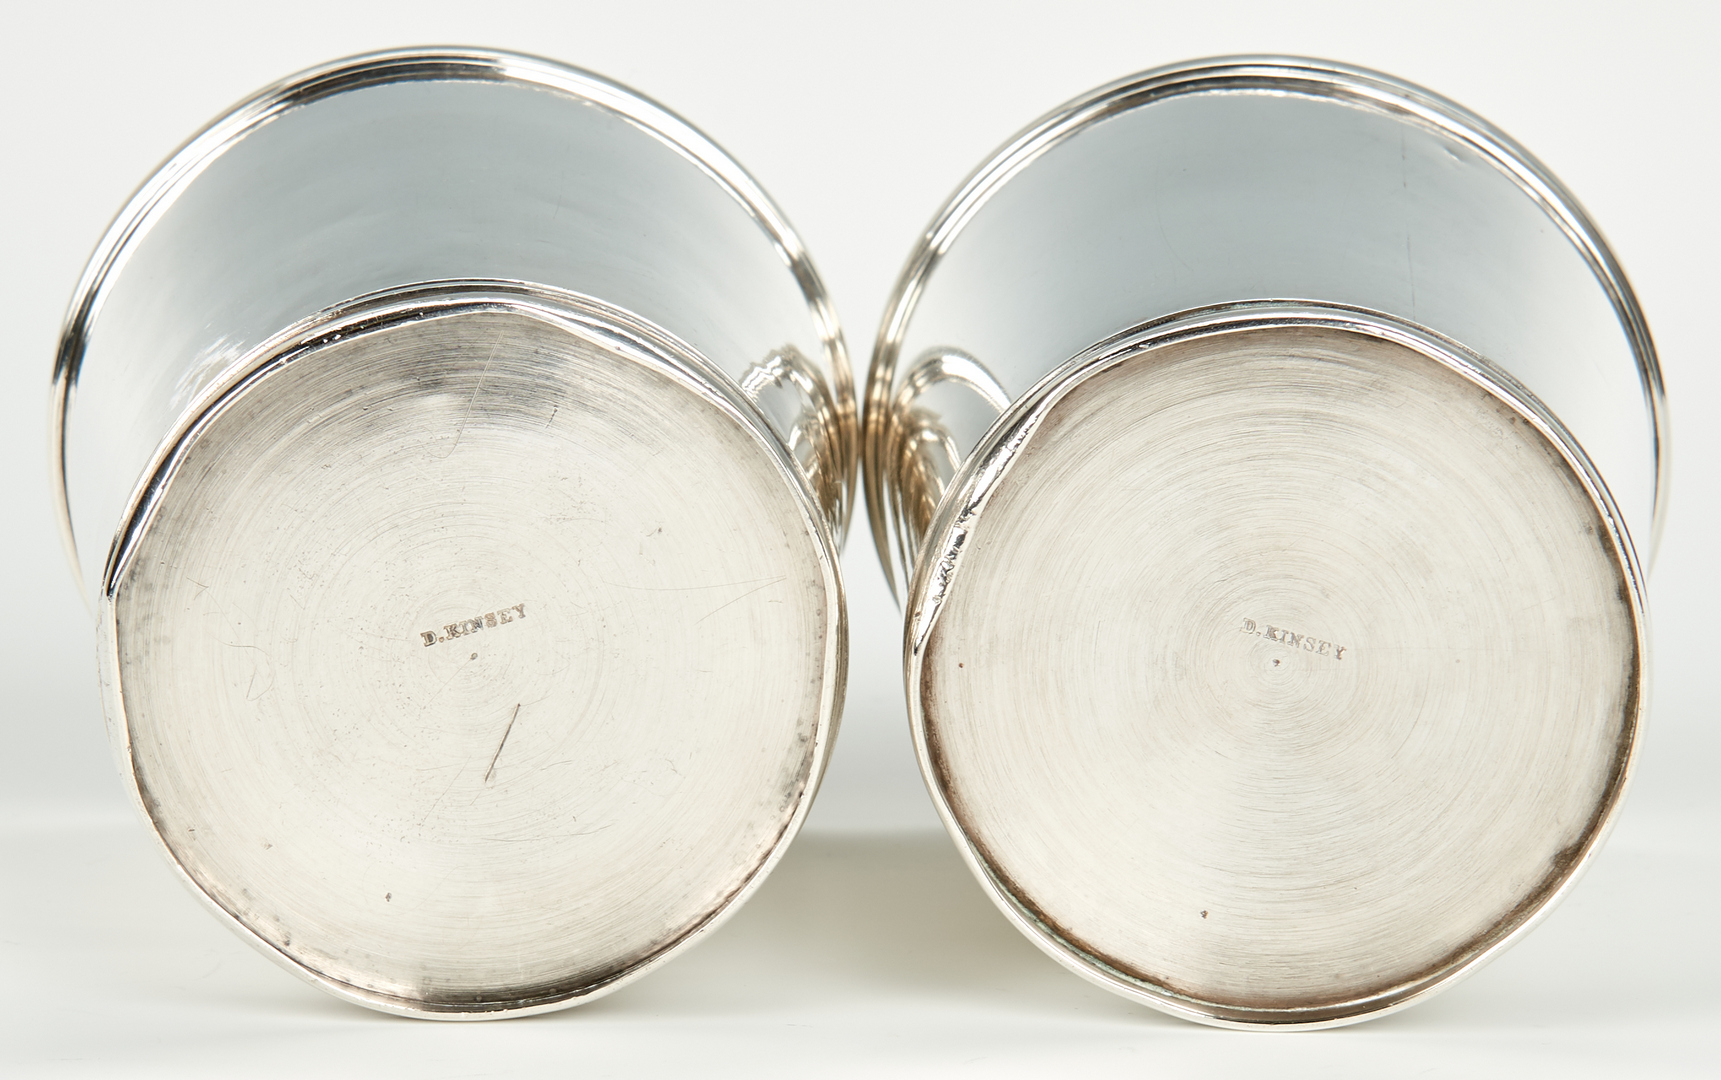 Lot 69: 4 Mint Julep Cups inc. Kinsey, Baldwin